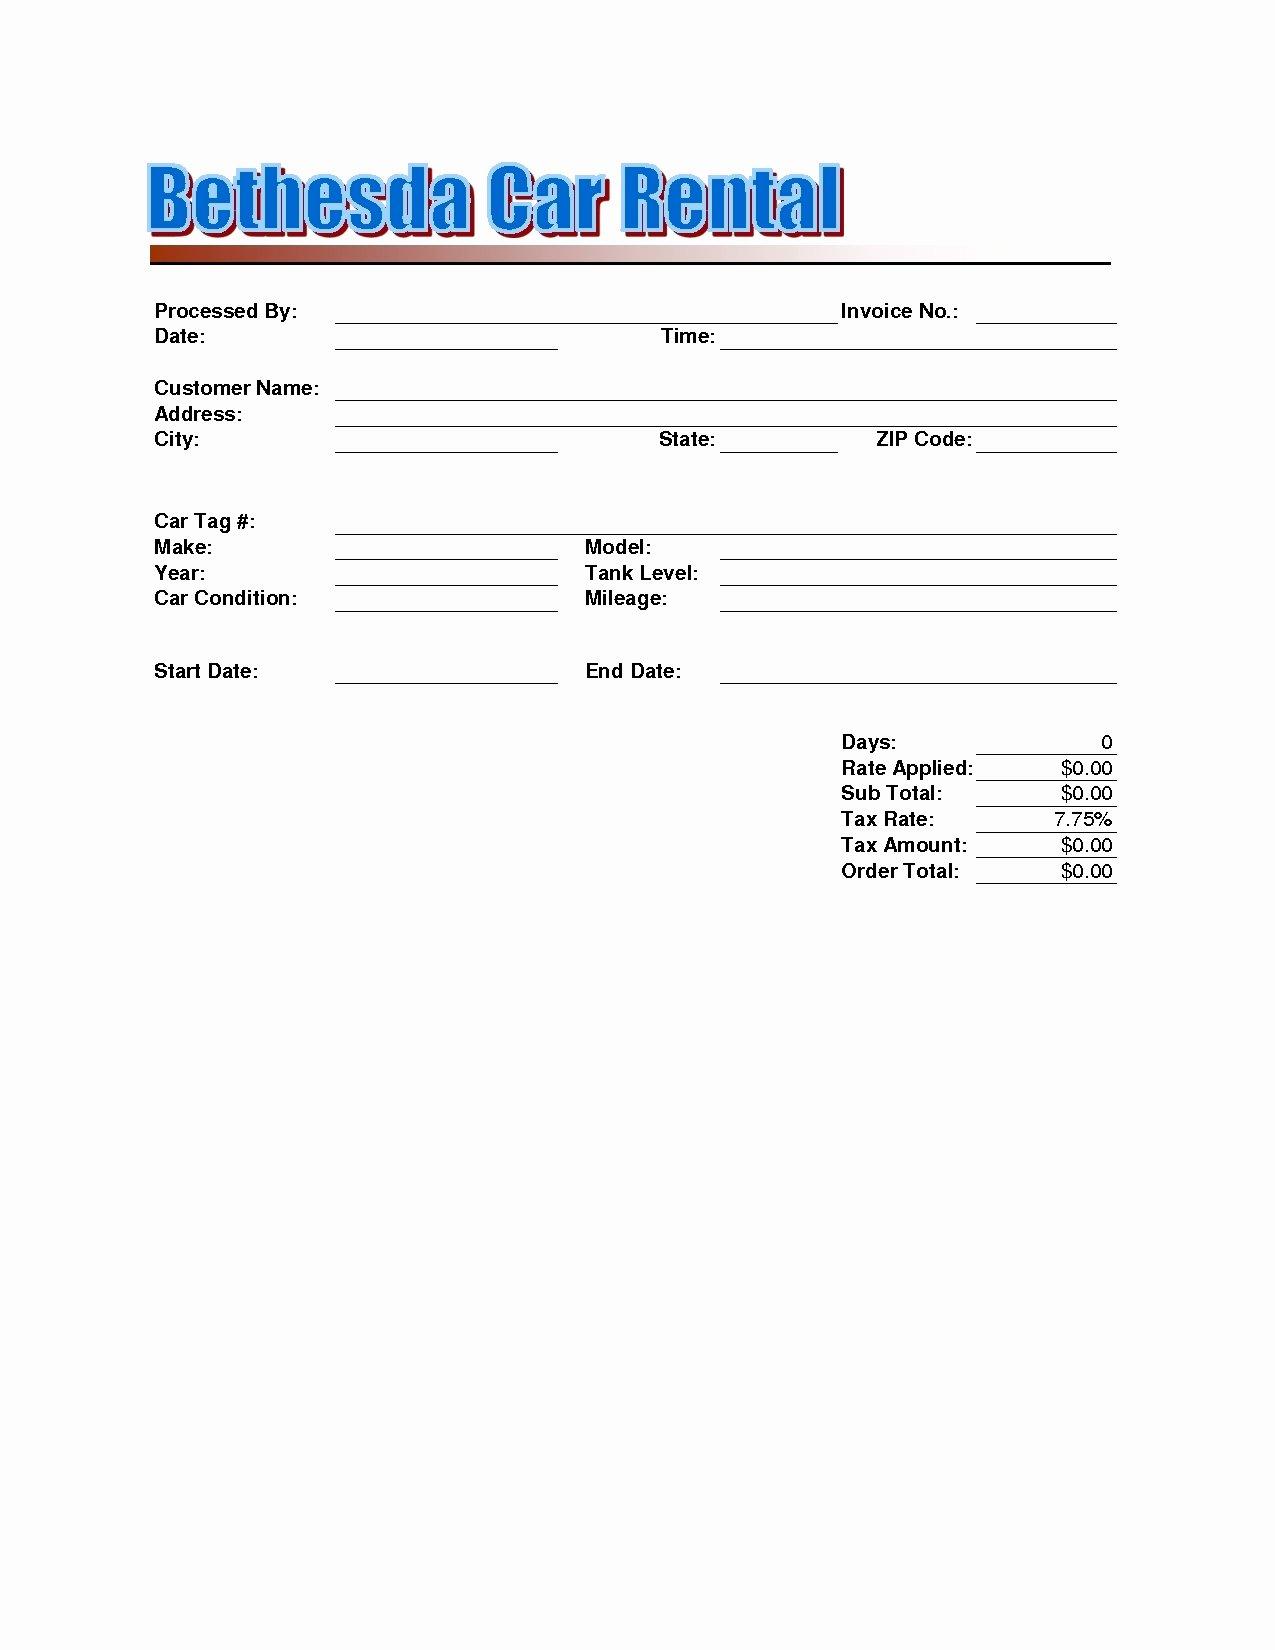 Car Rental Receipt Template New Rent A Car Invoice Invoice Template Ideas